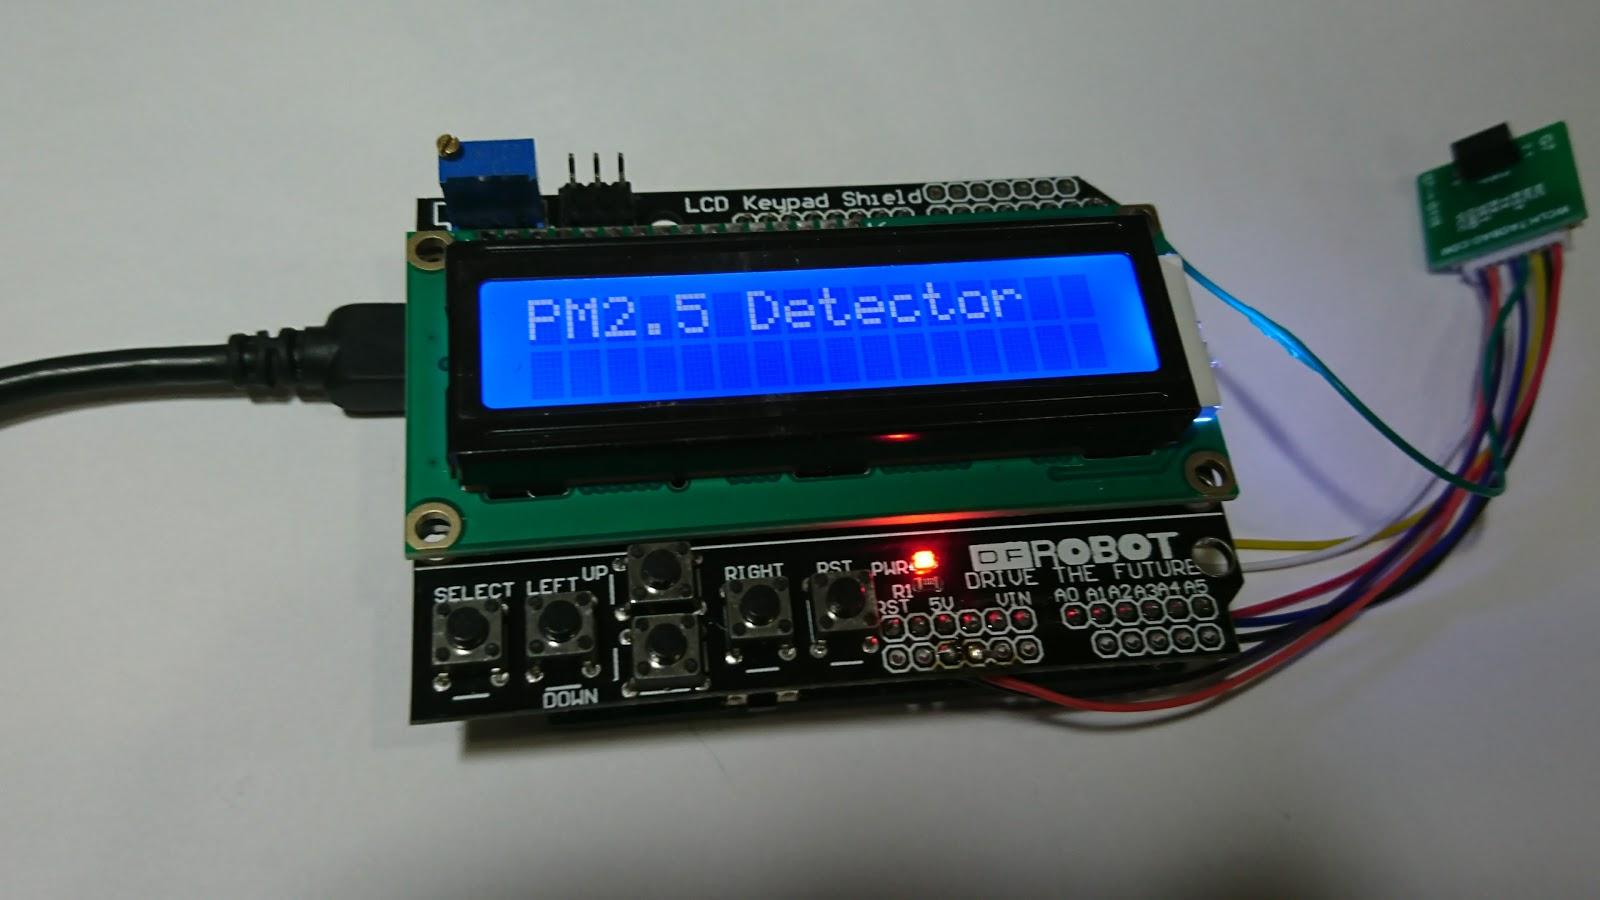 Seth C: DIY製作PM2 5空氣偵測器step by step